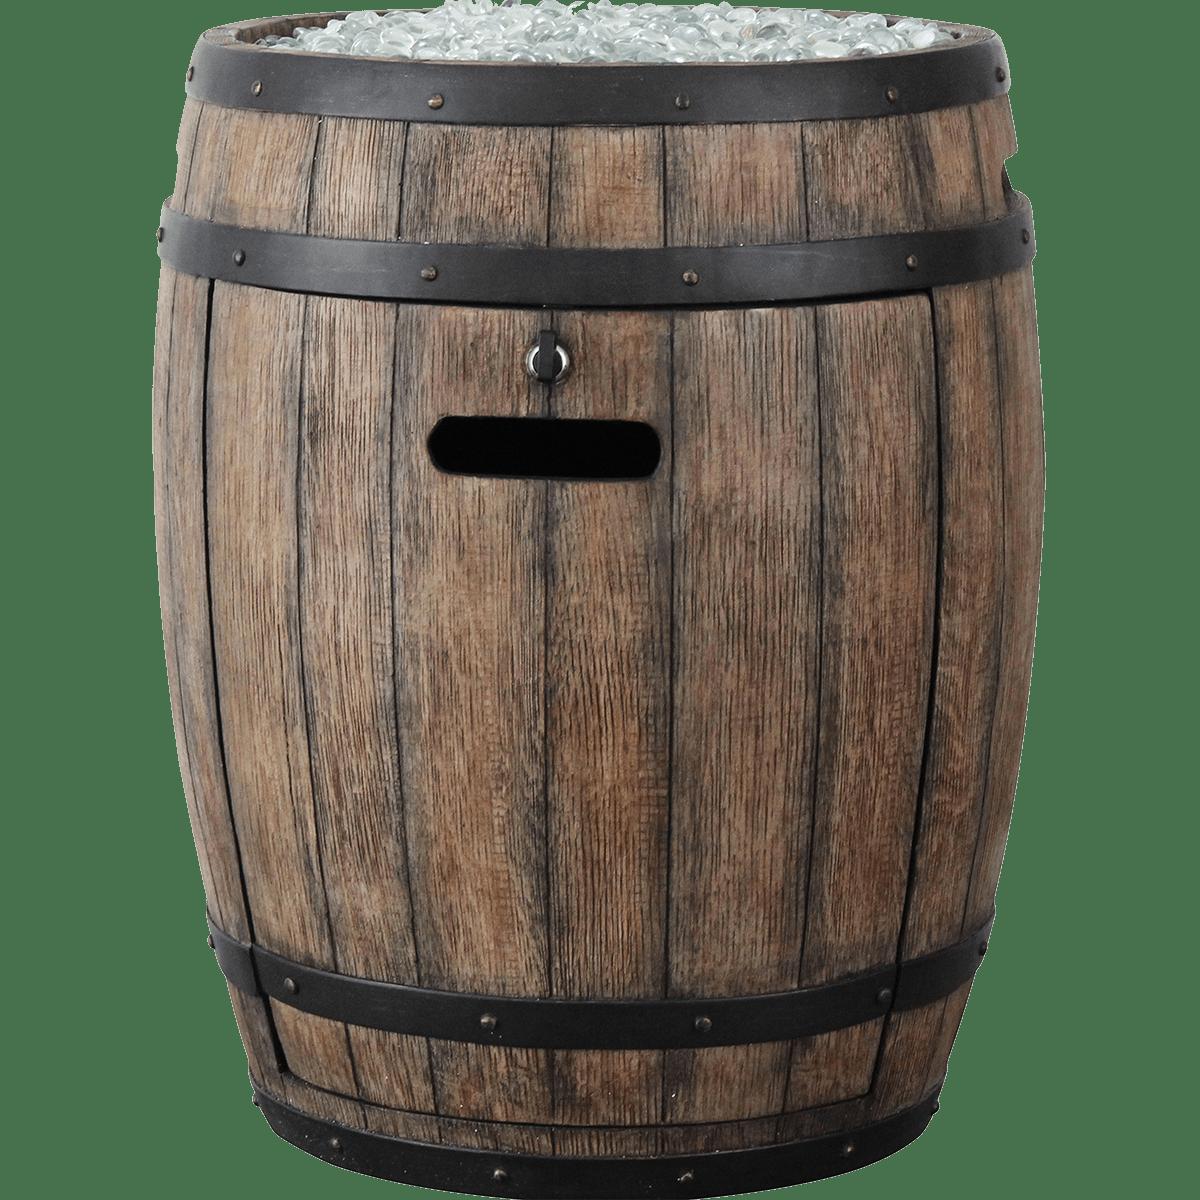 Homcomfort Whiskey Barrel Propane Gas Patio Heater Sylvane